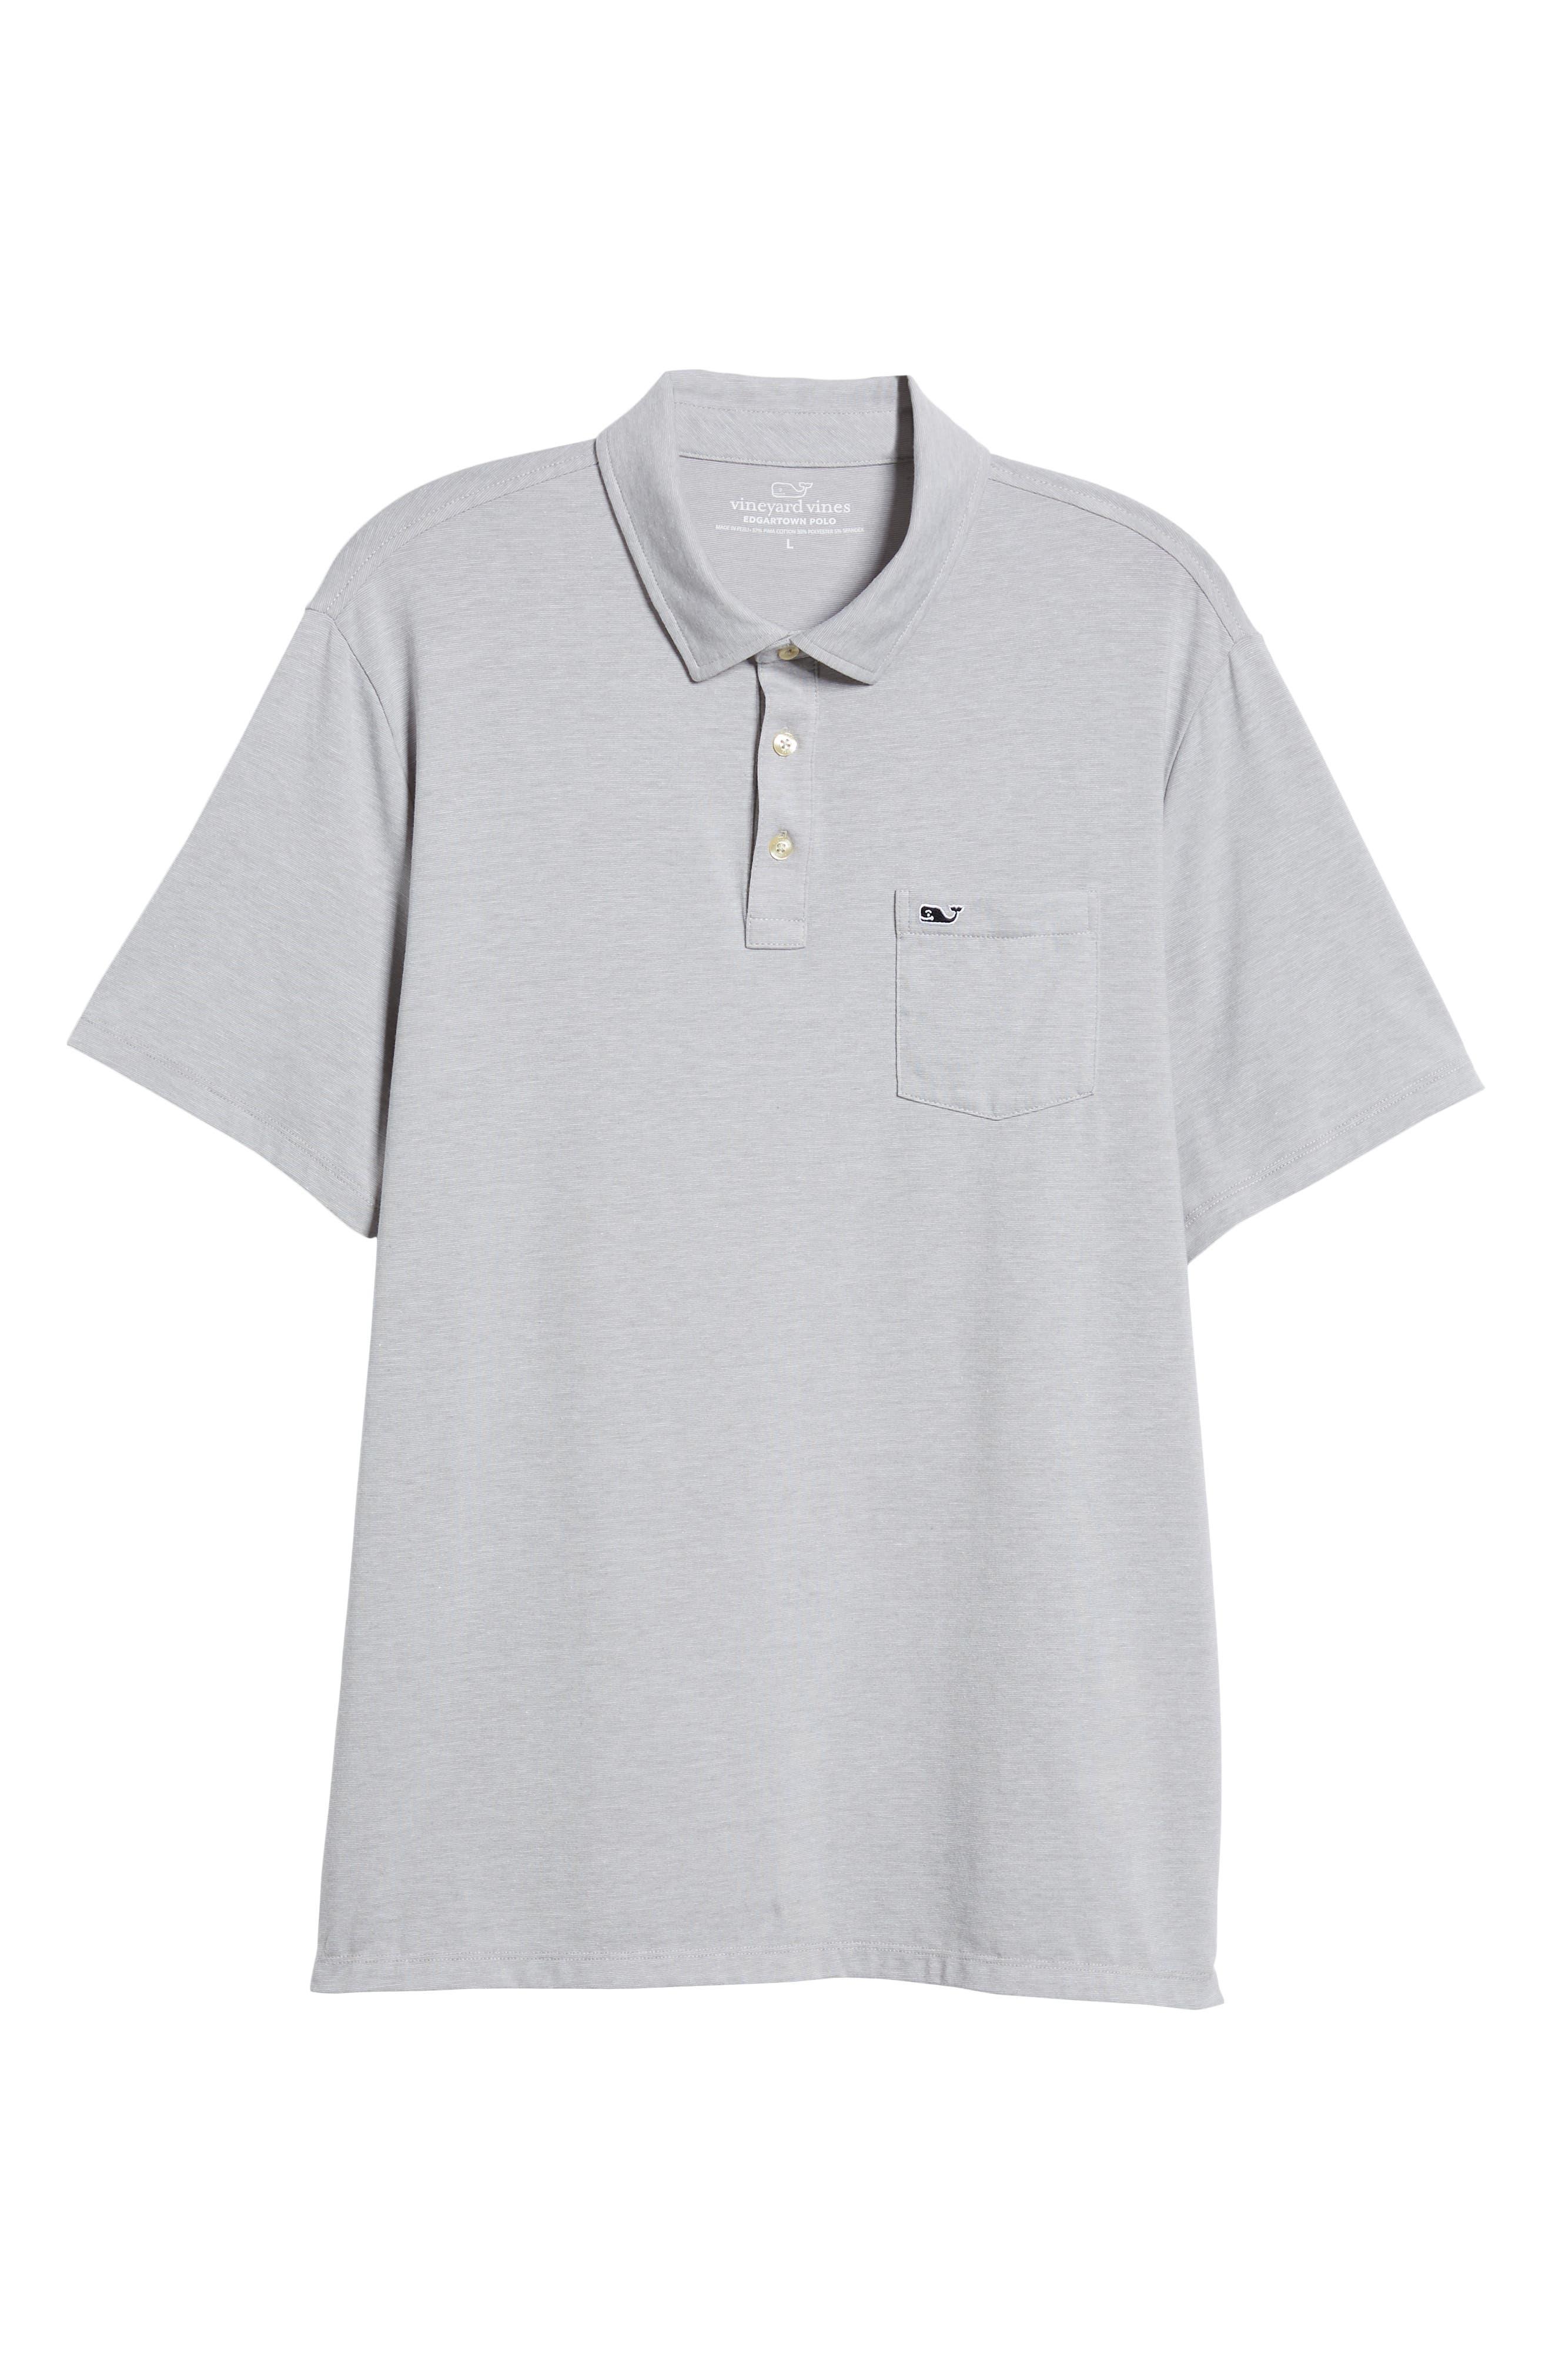 Edgartown Polo Shirt,                             Alternate thumbnail 6, color,                             MONUMENT GRAY